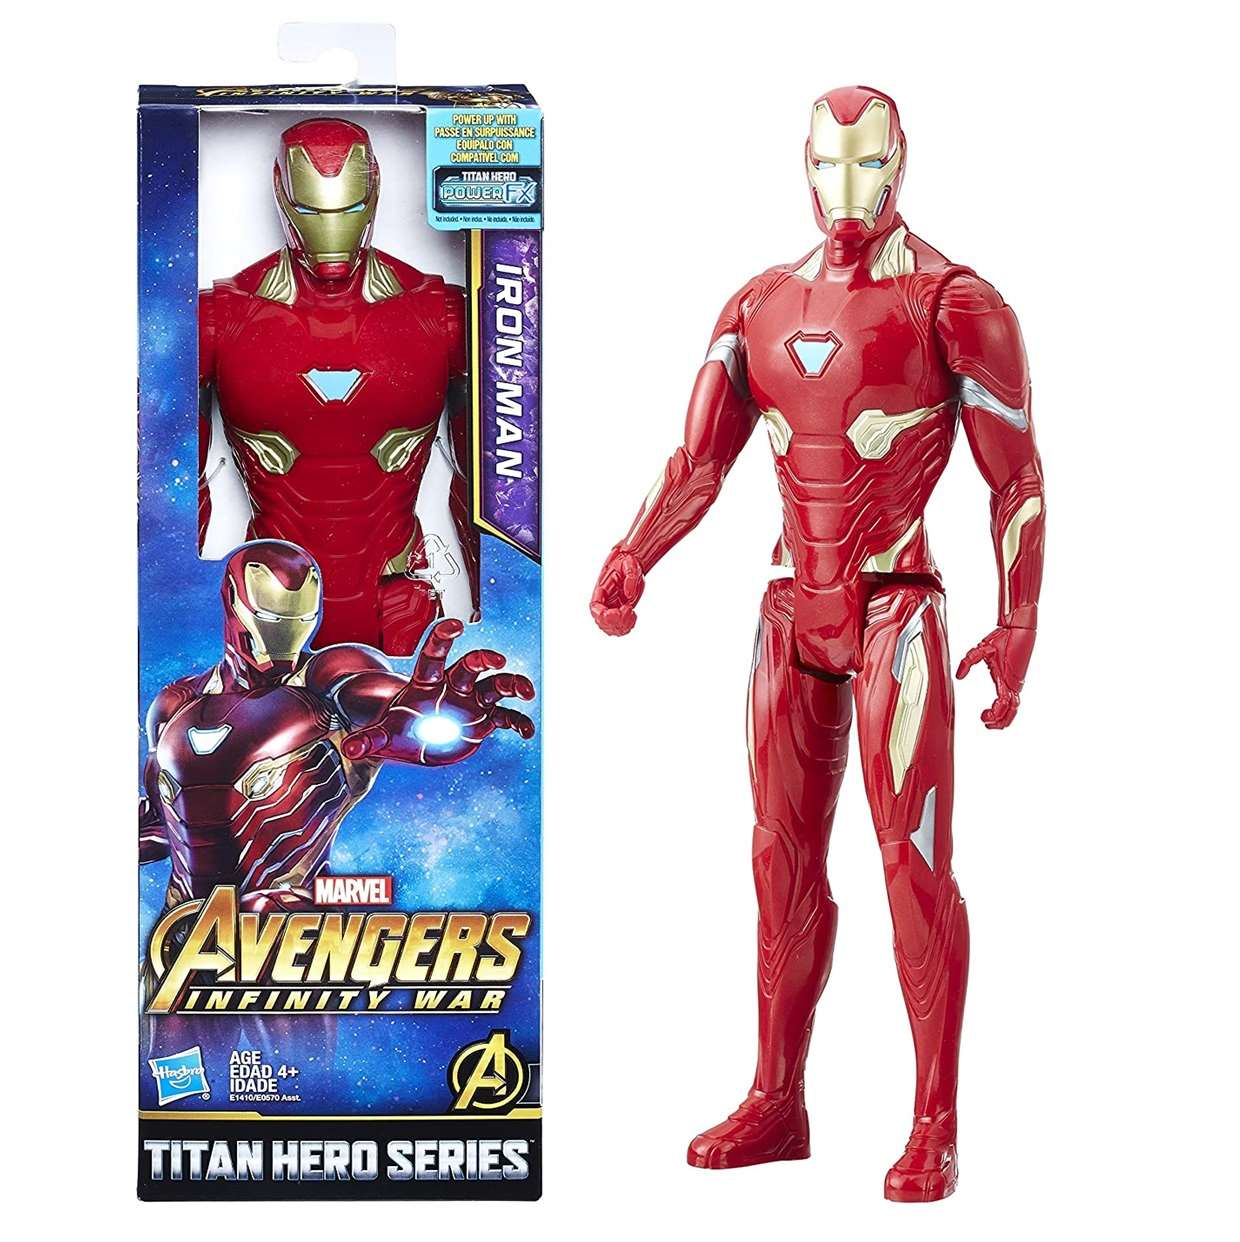 Iron Man Figura Power Fx Avengers Infinity War 12 Pulgadas